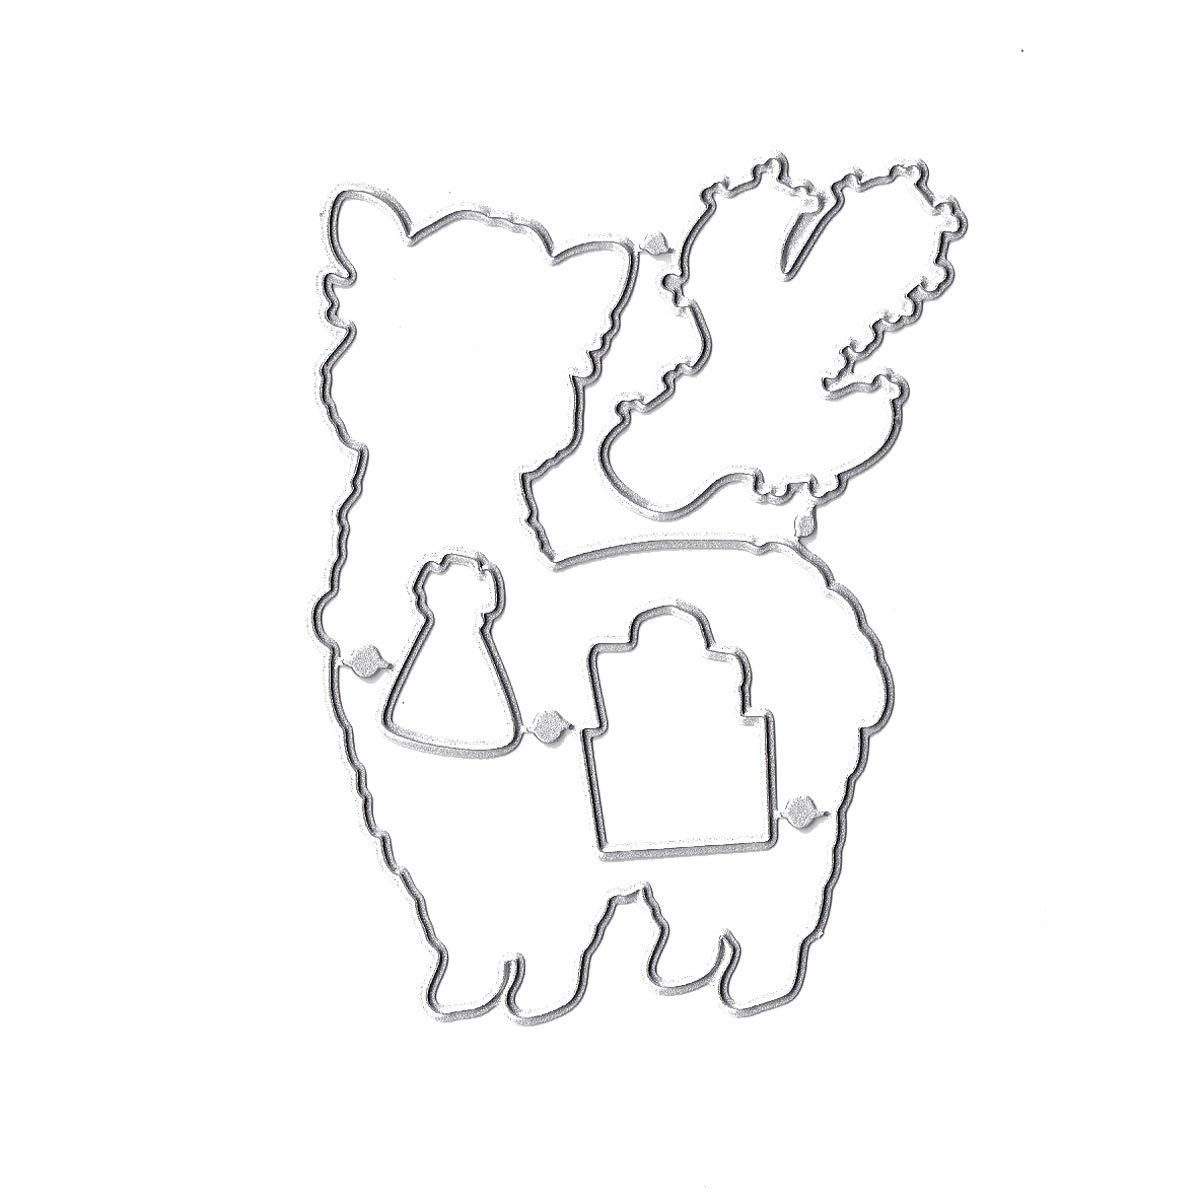 Desert Cactus Alpaca Ea Clear Cling Stamp /& Die Cut Set for Scrapbooking Card Making Bundle-2 Items- Dies Stamp Stencil 1